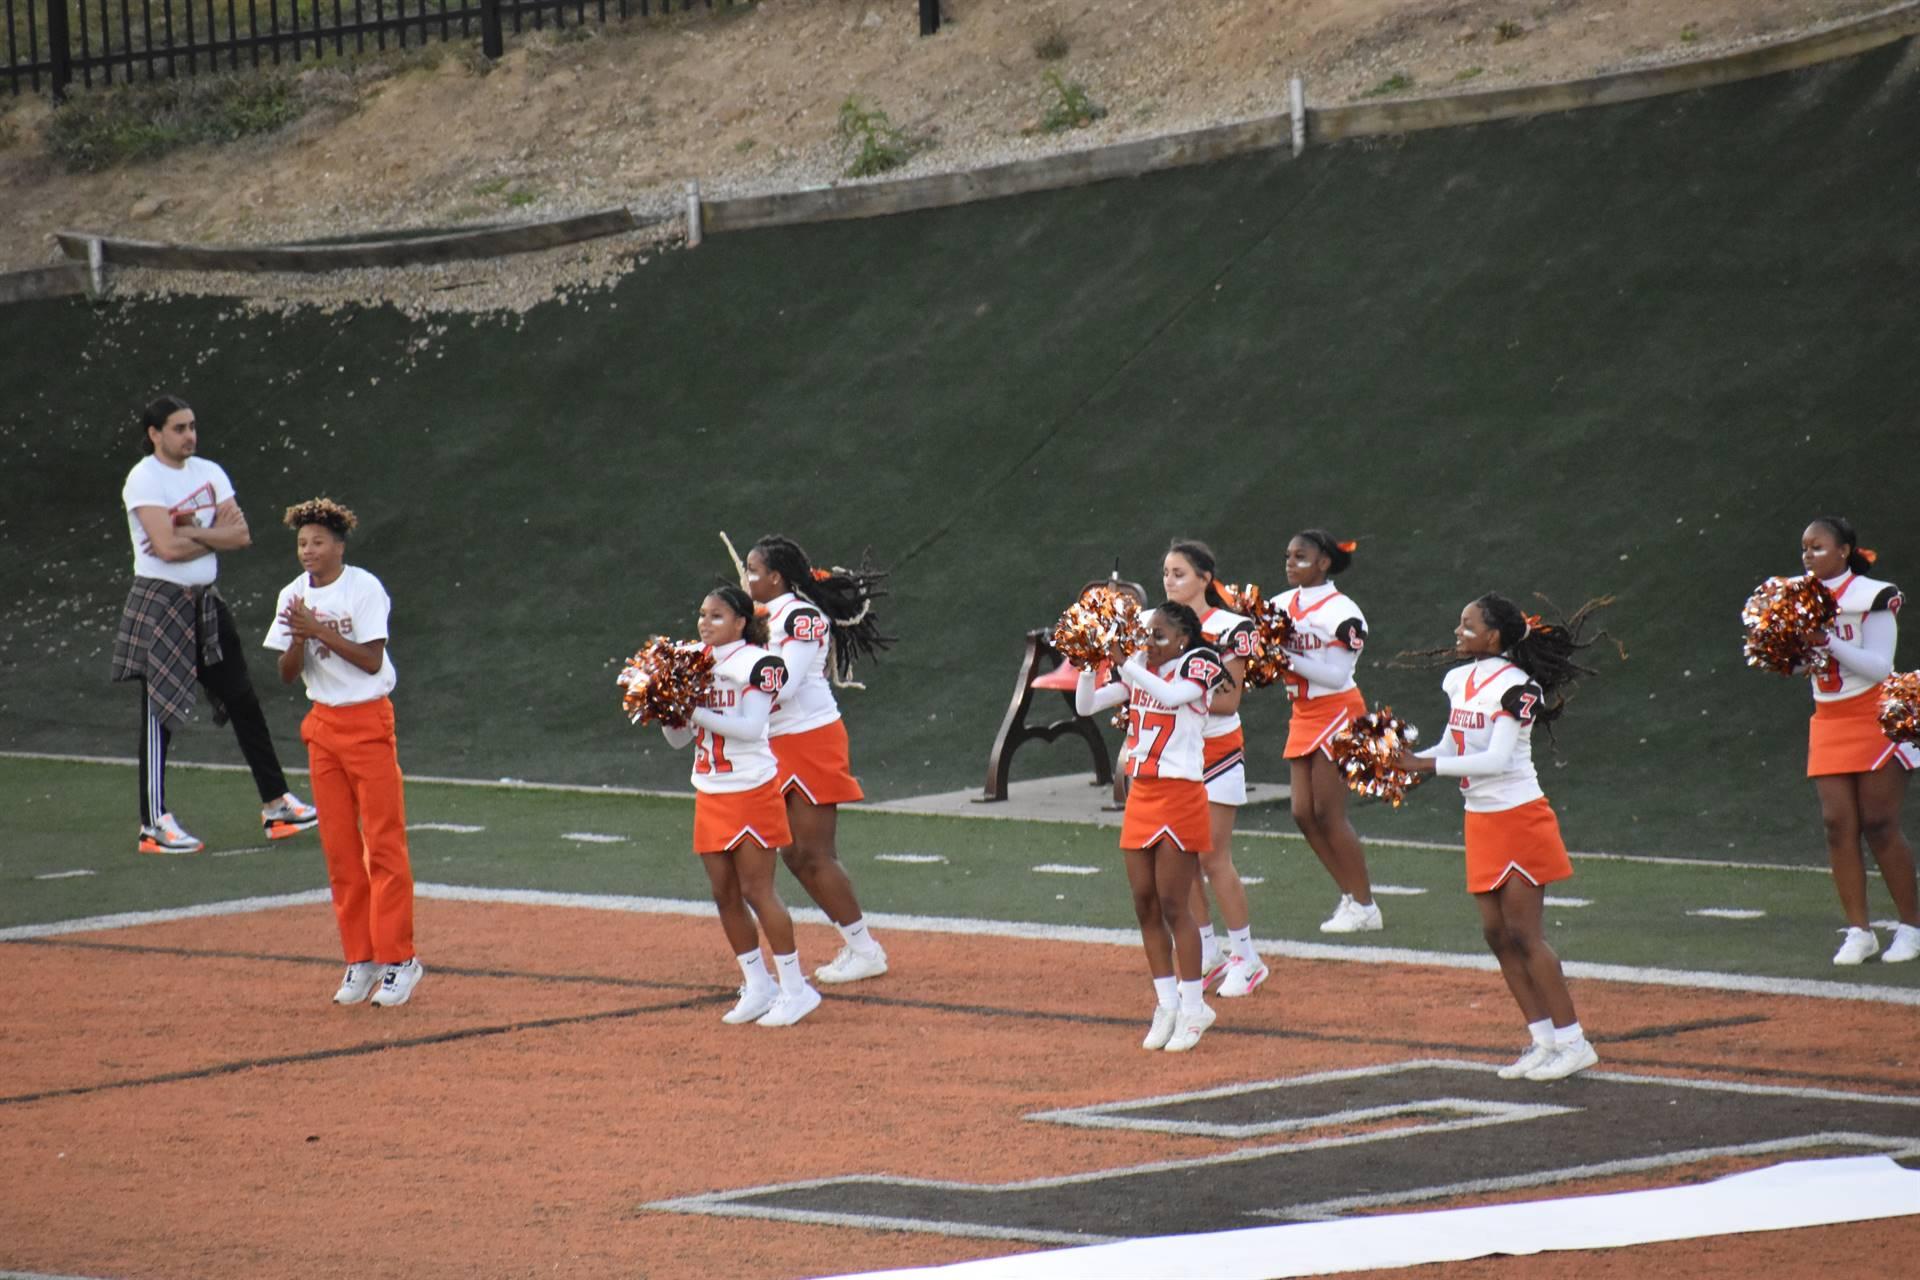 Cheerleaders performing at Homecoming game